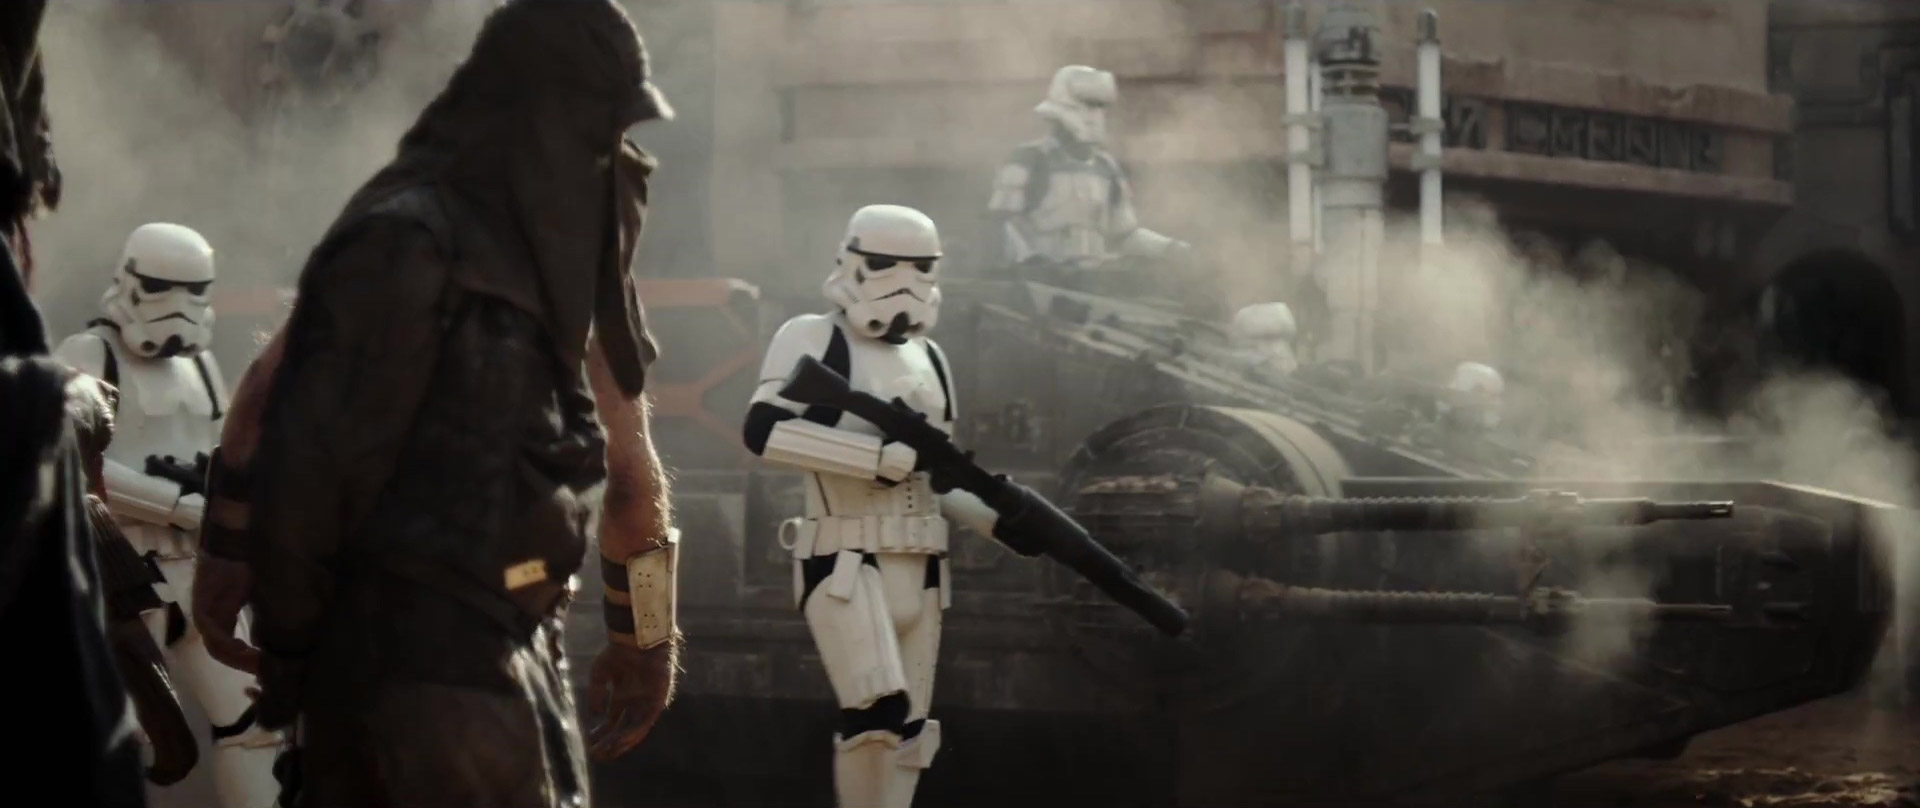 starwars-rogue-one-cool-first-teaser-trailer